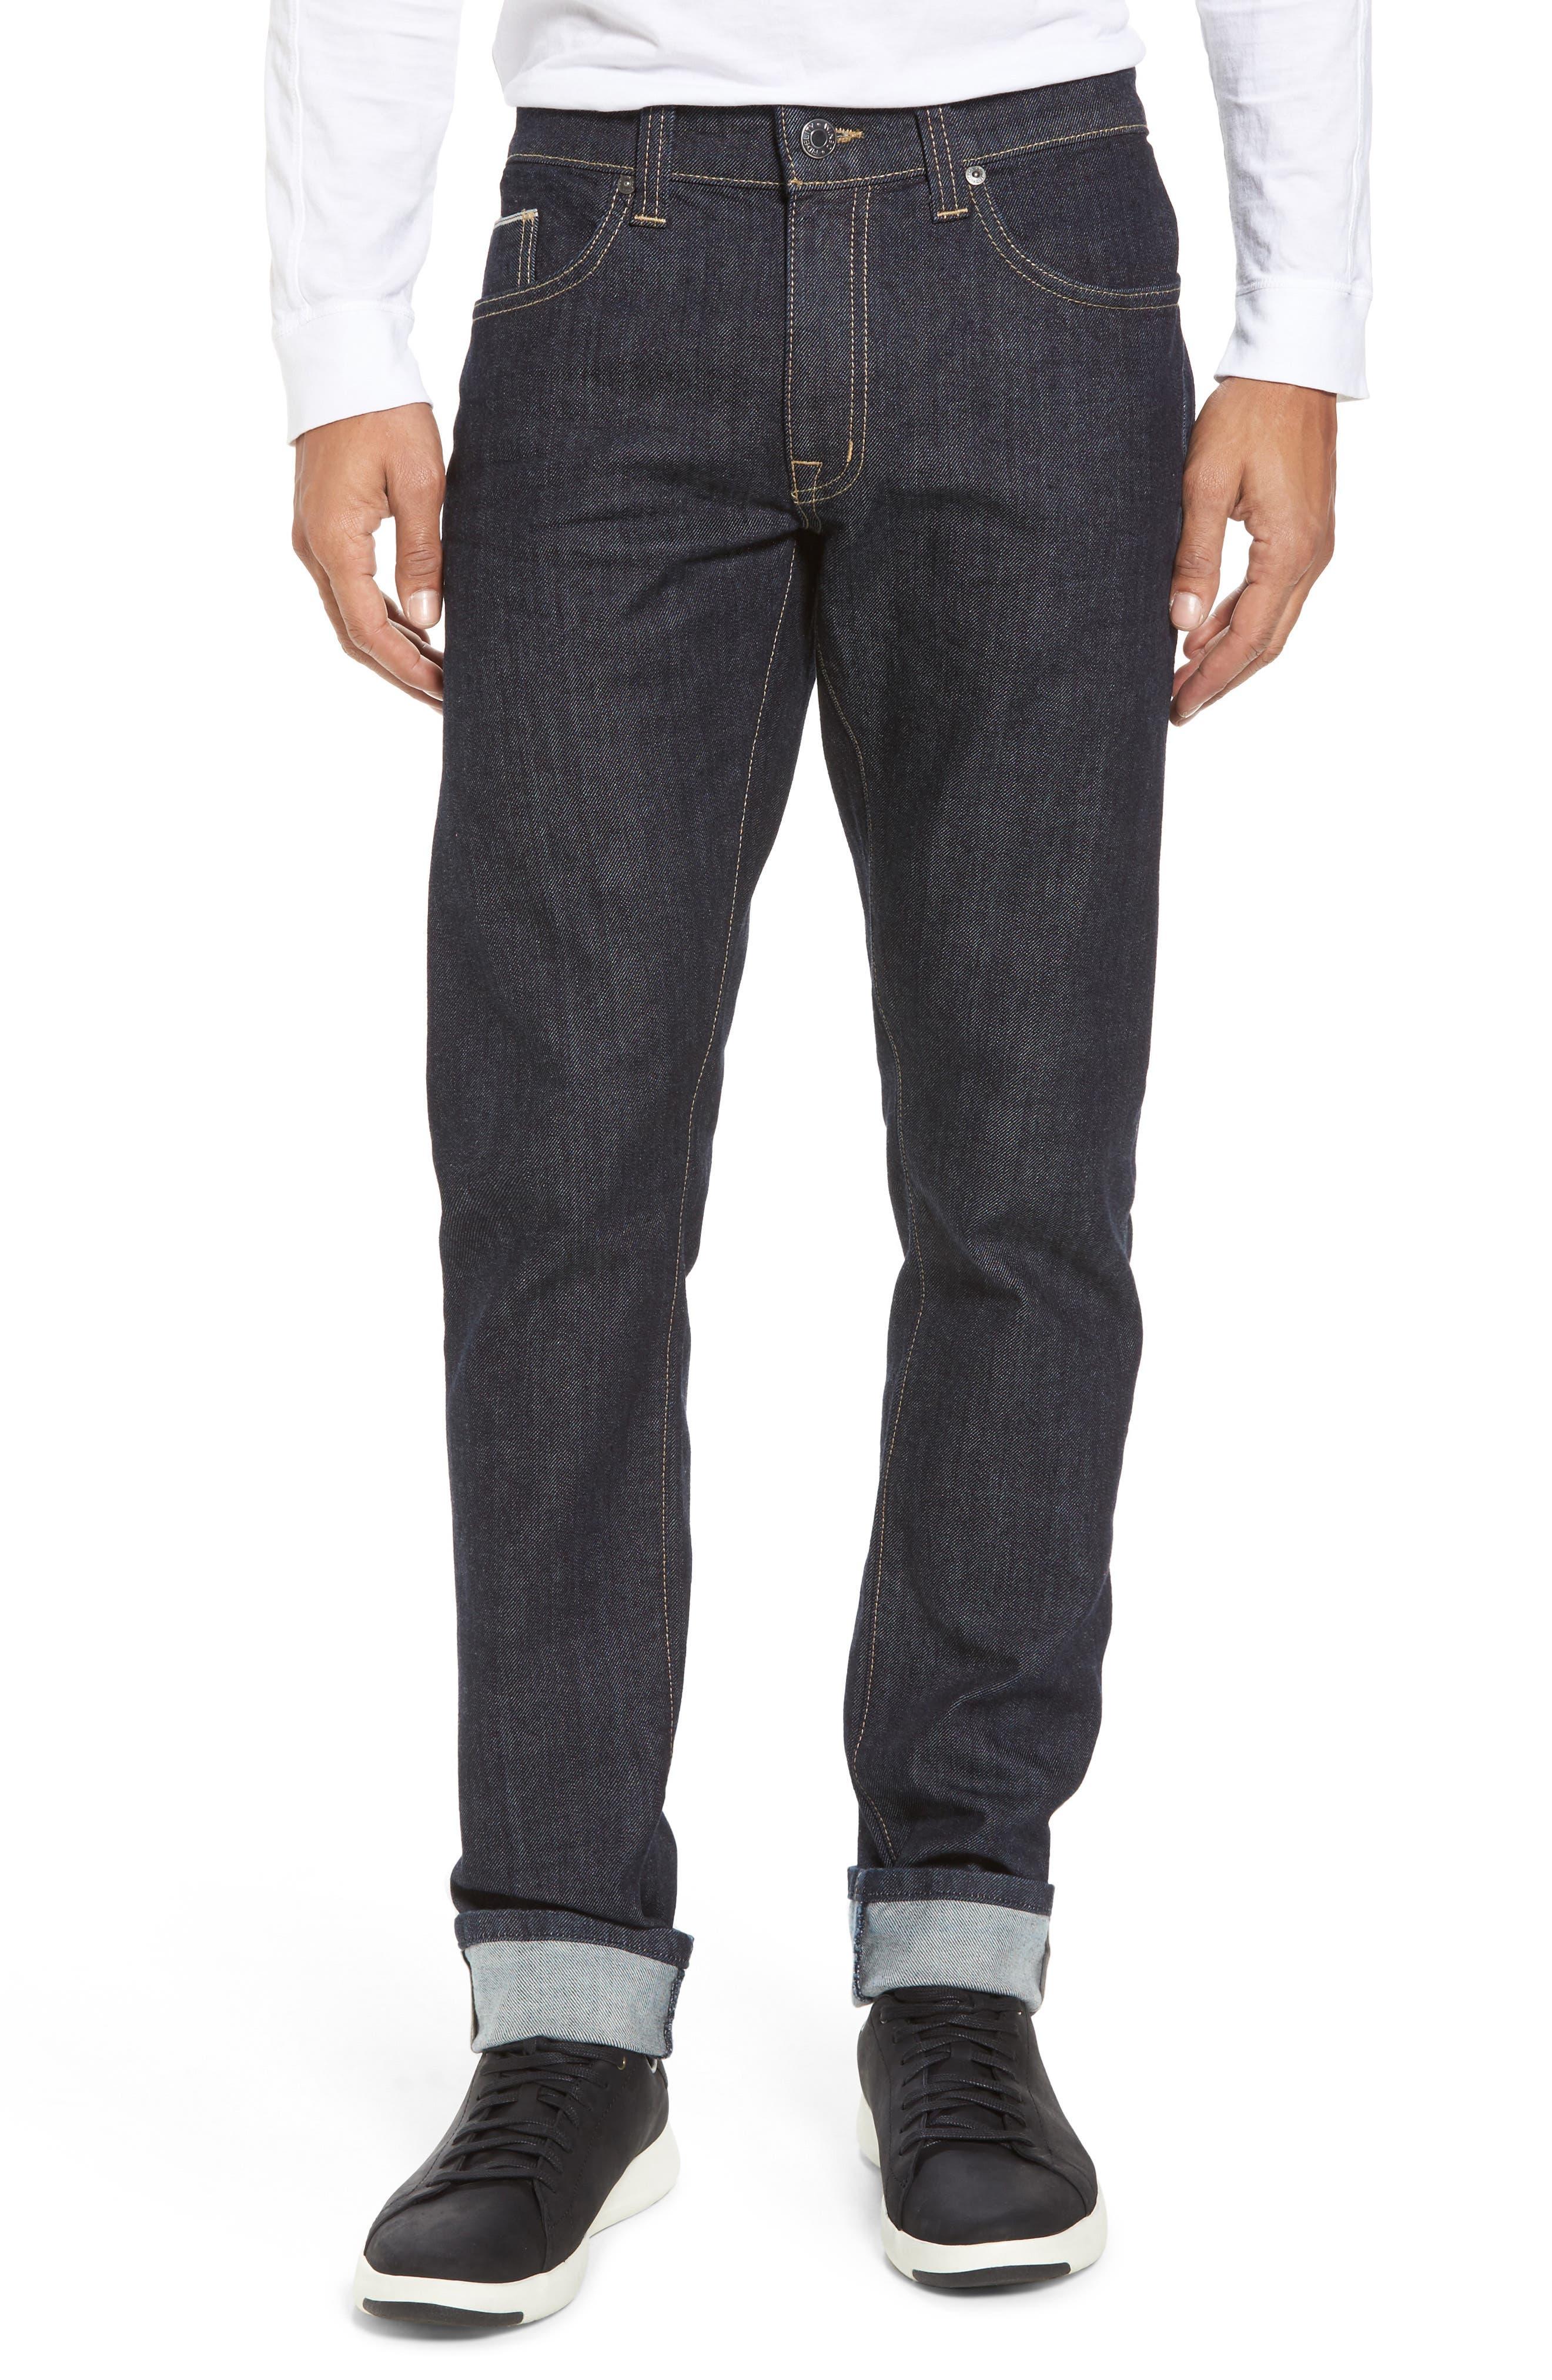 Alternate Image 1 Selected - Fidelity Denim Torino Slim Fit Jeans (Akiba)